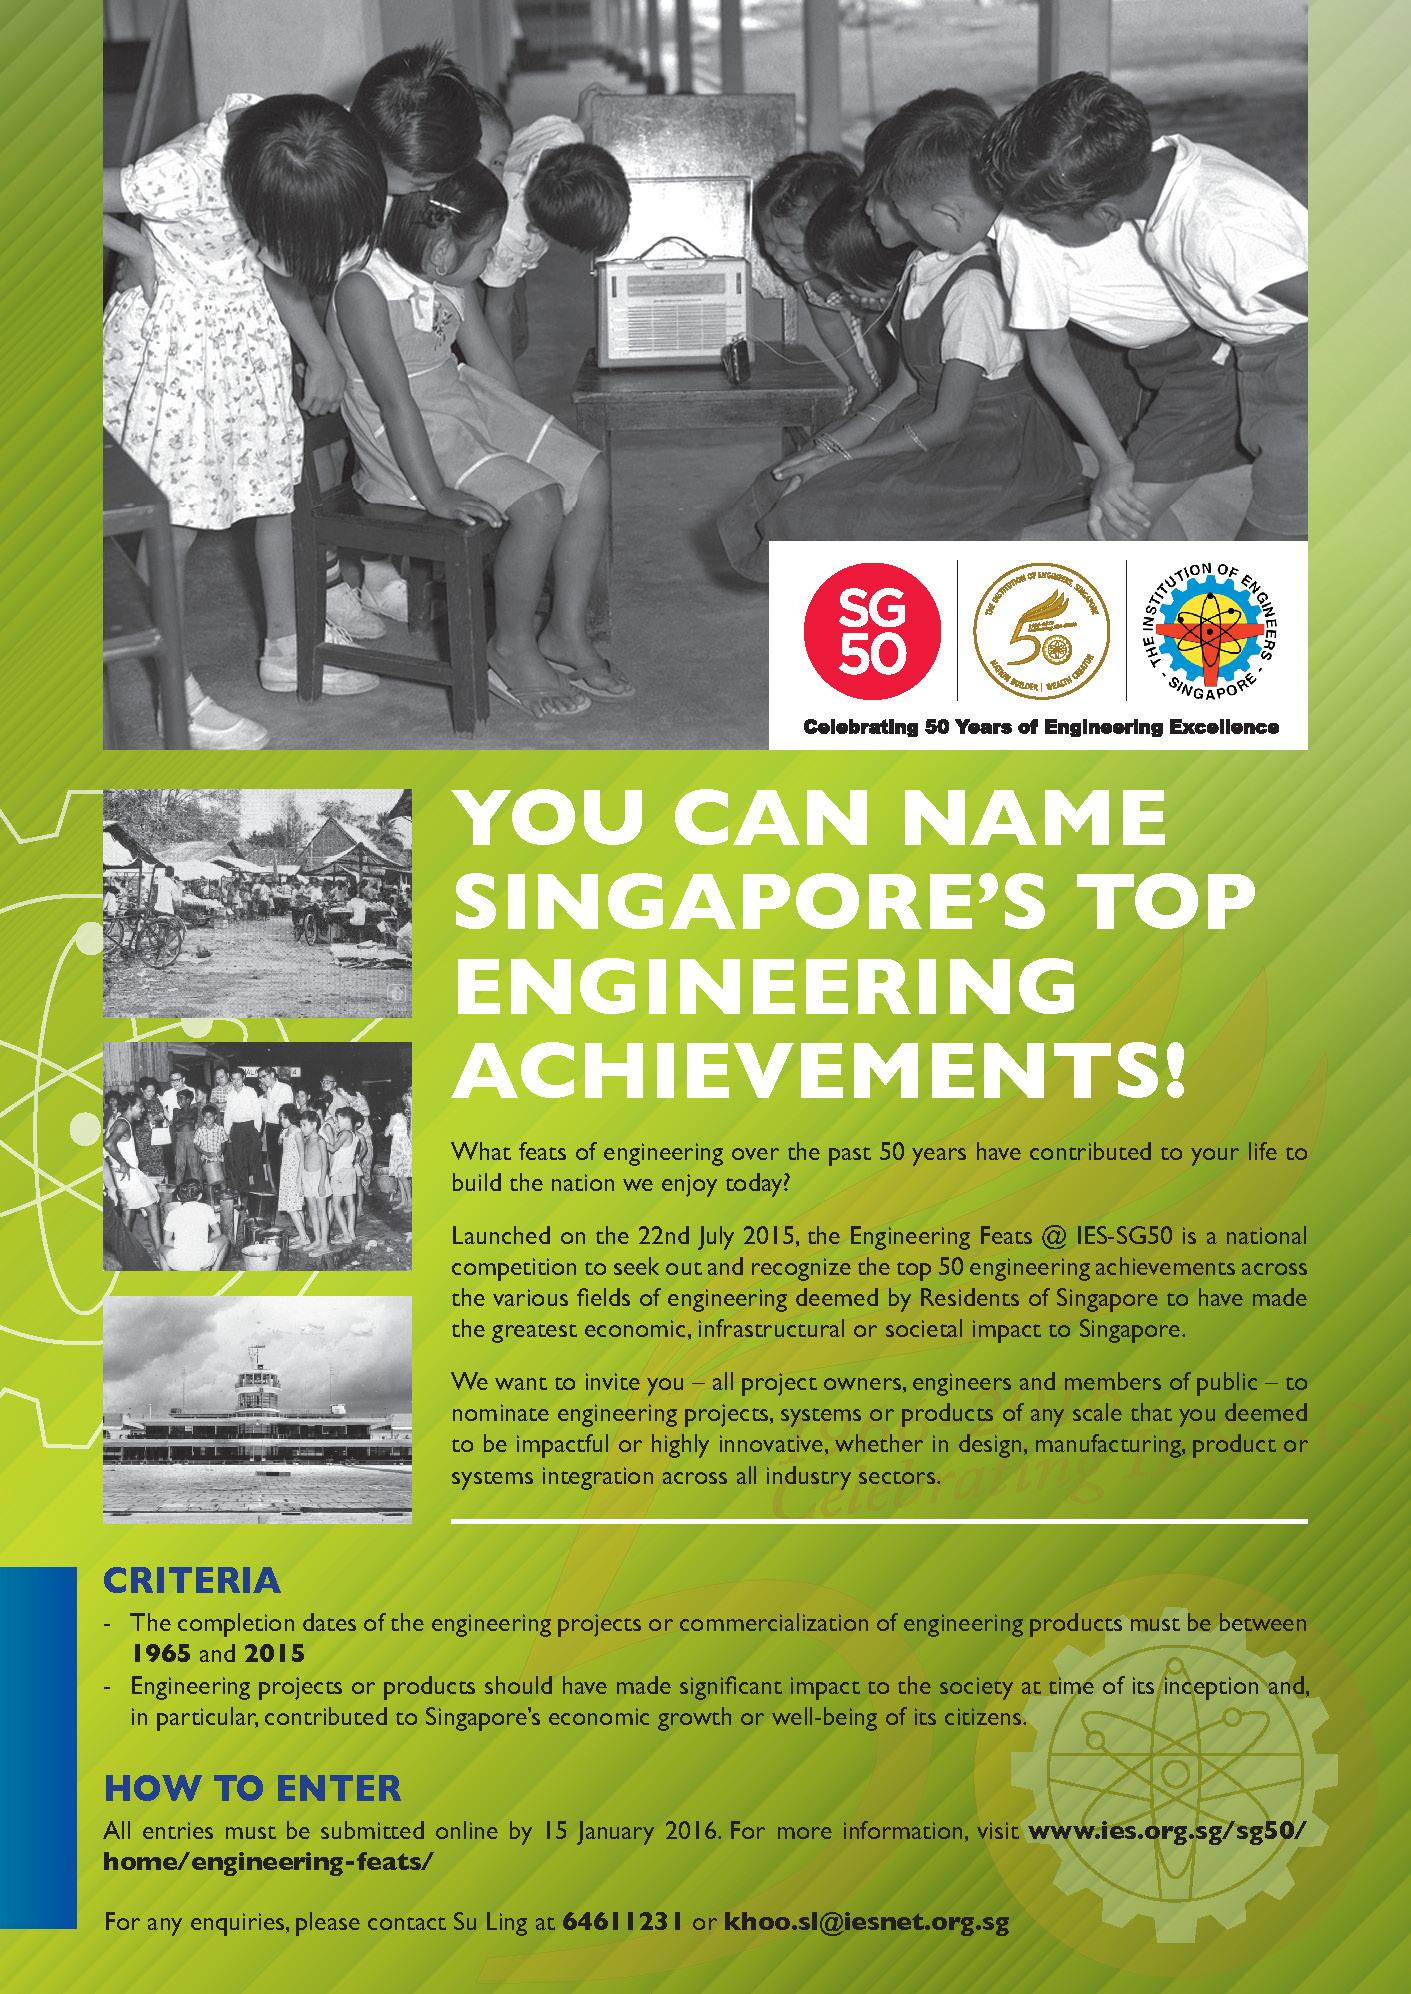 Engineering Feats flyer